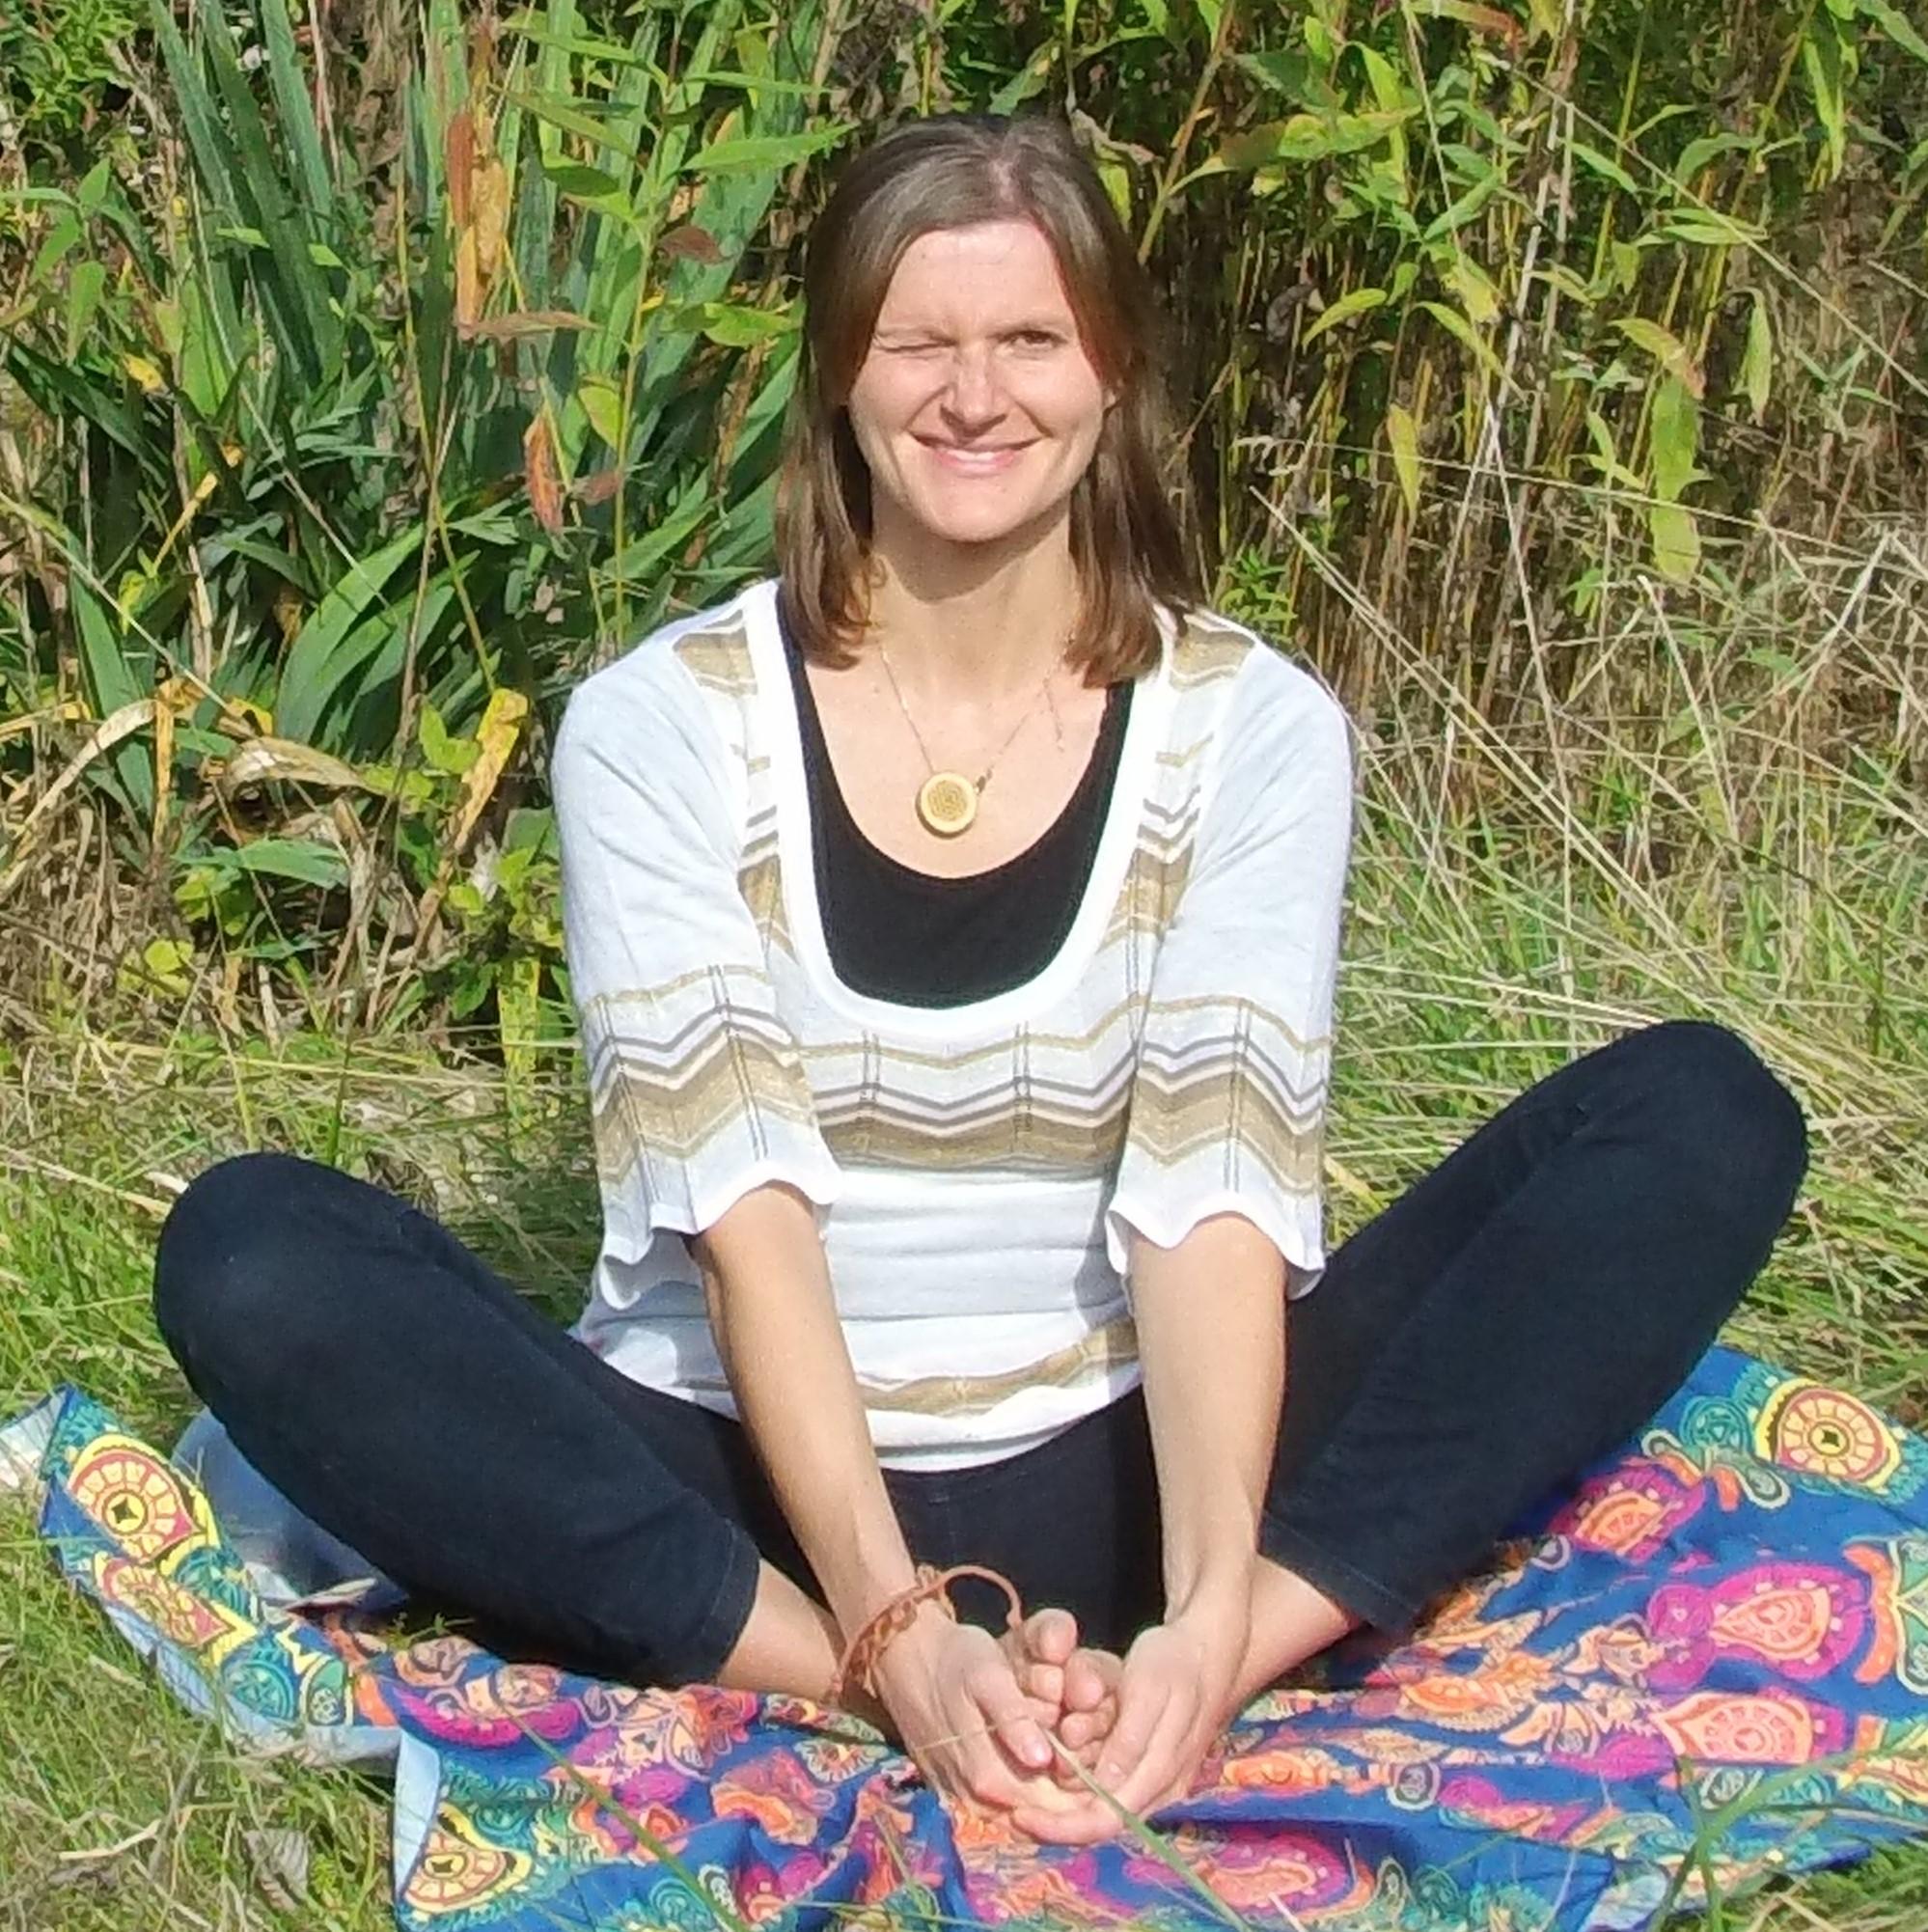 Yoga-Schmetterlingsposition. Da lacht meine Seele;-)))